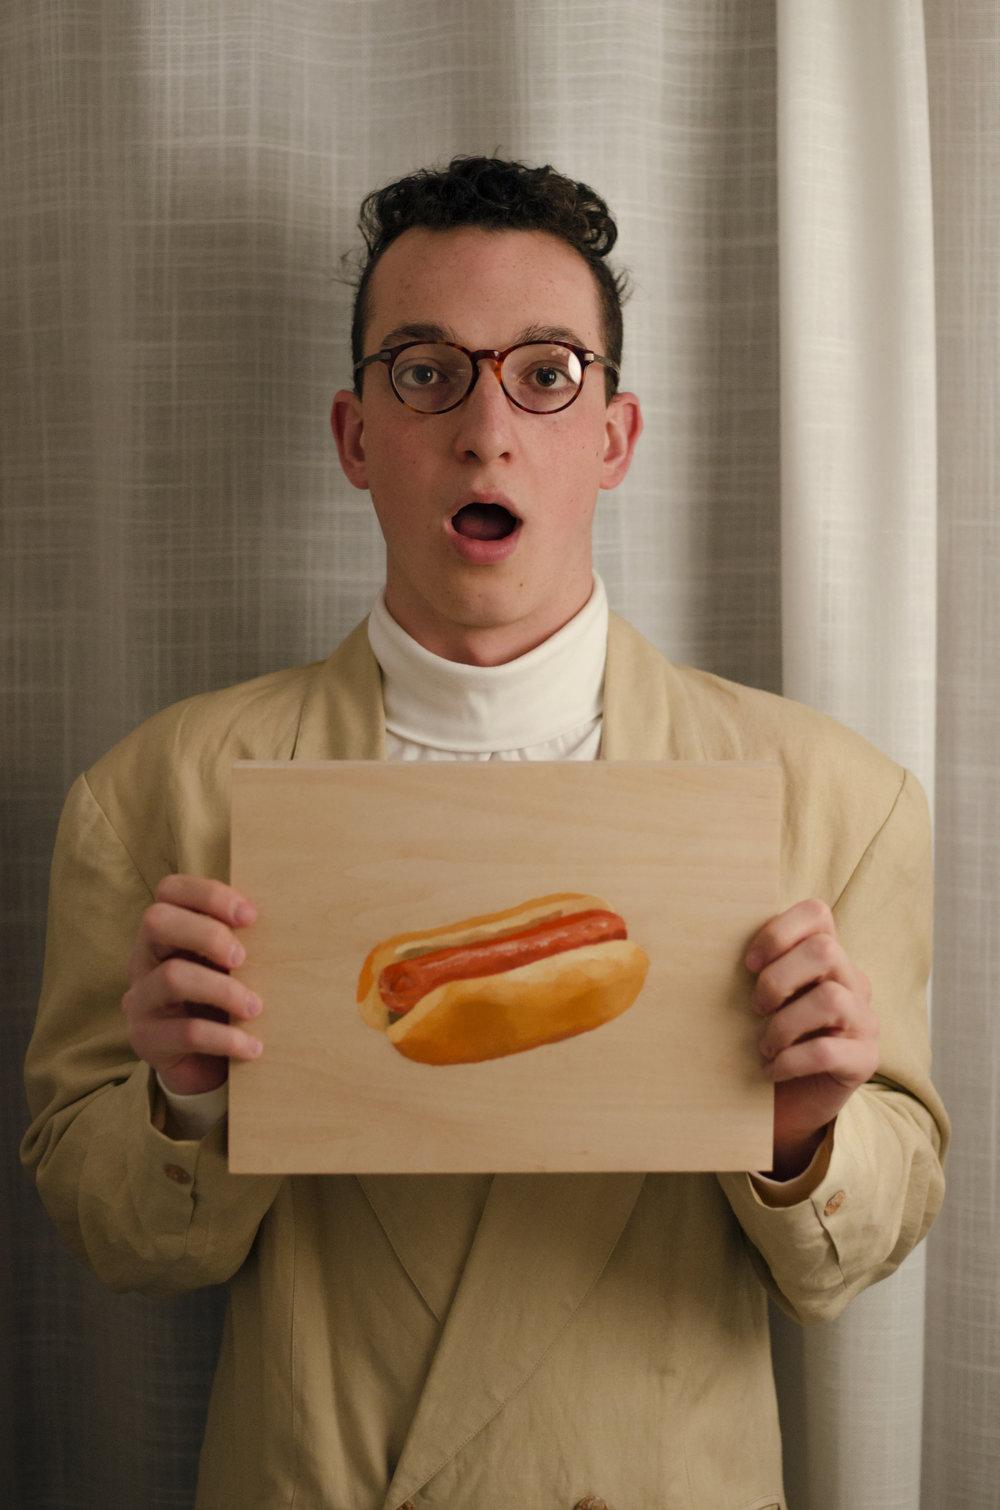 Hot dog 1.jpg